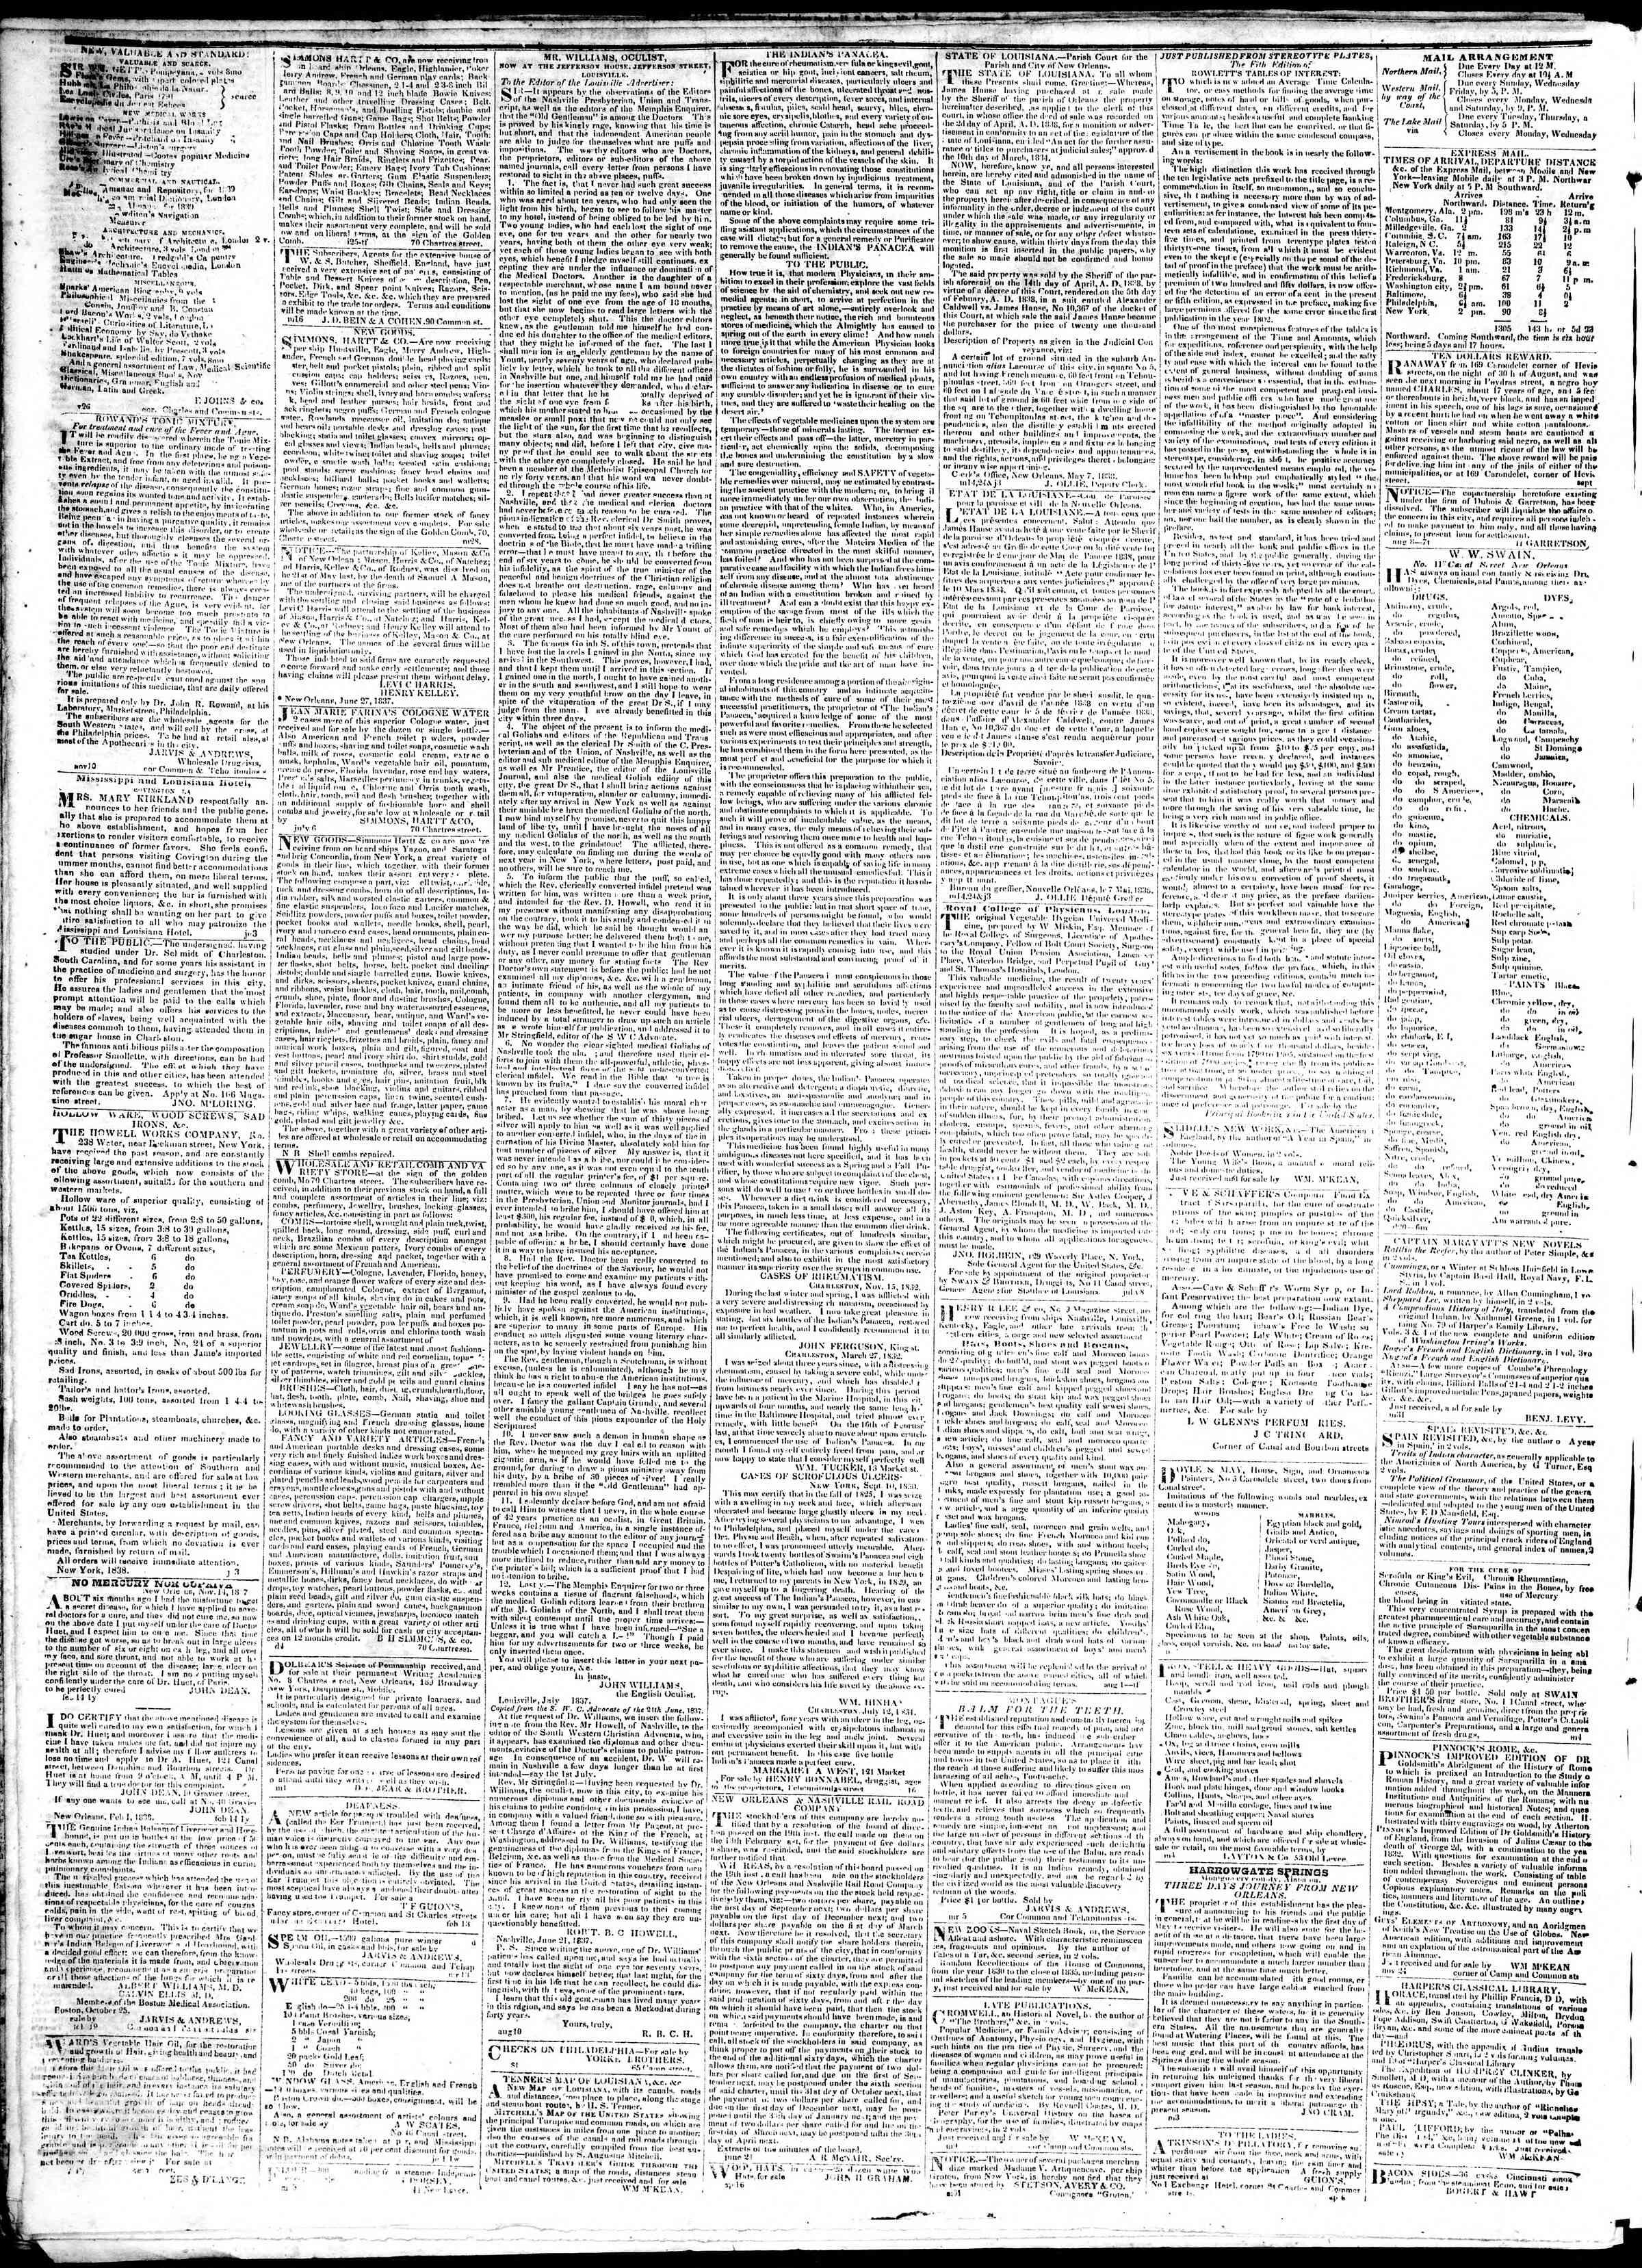 January 22, 1839 Tarihli True American Gazetesi Sayfa 4